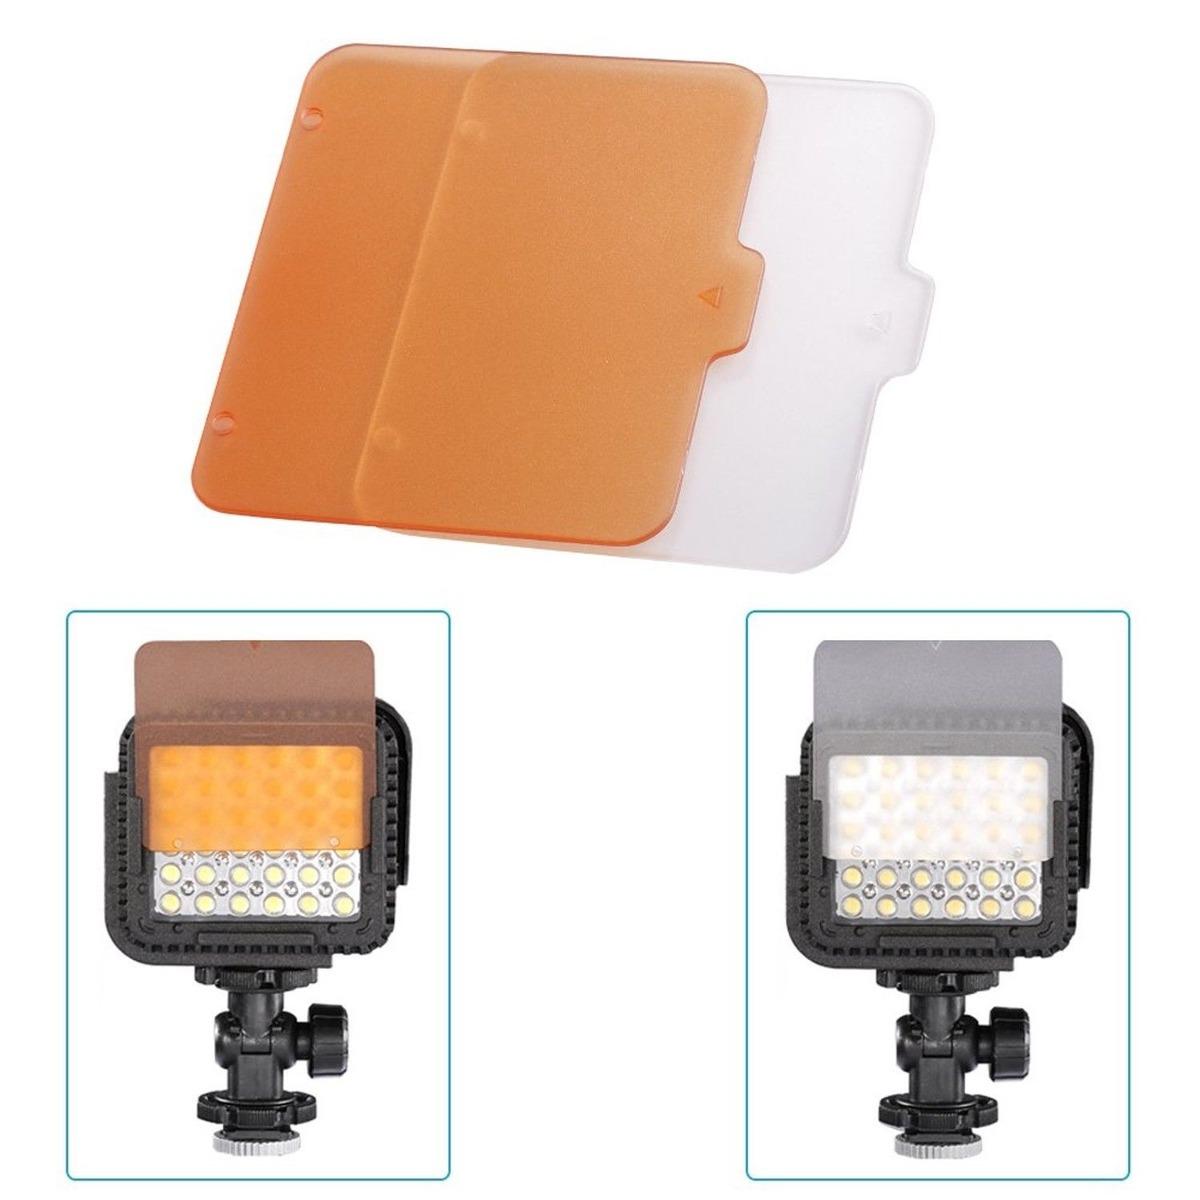 Neewer  CN-LUX360 5400K regulable LED Luz de vídeo//lámpara de videocámara